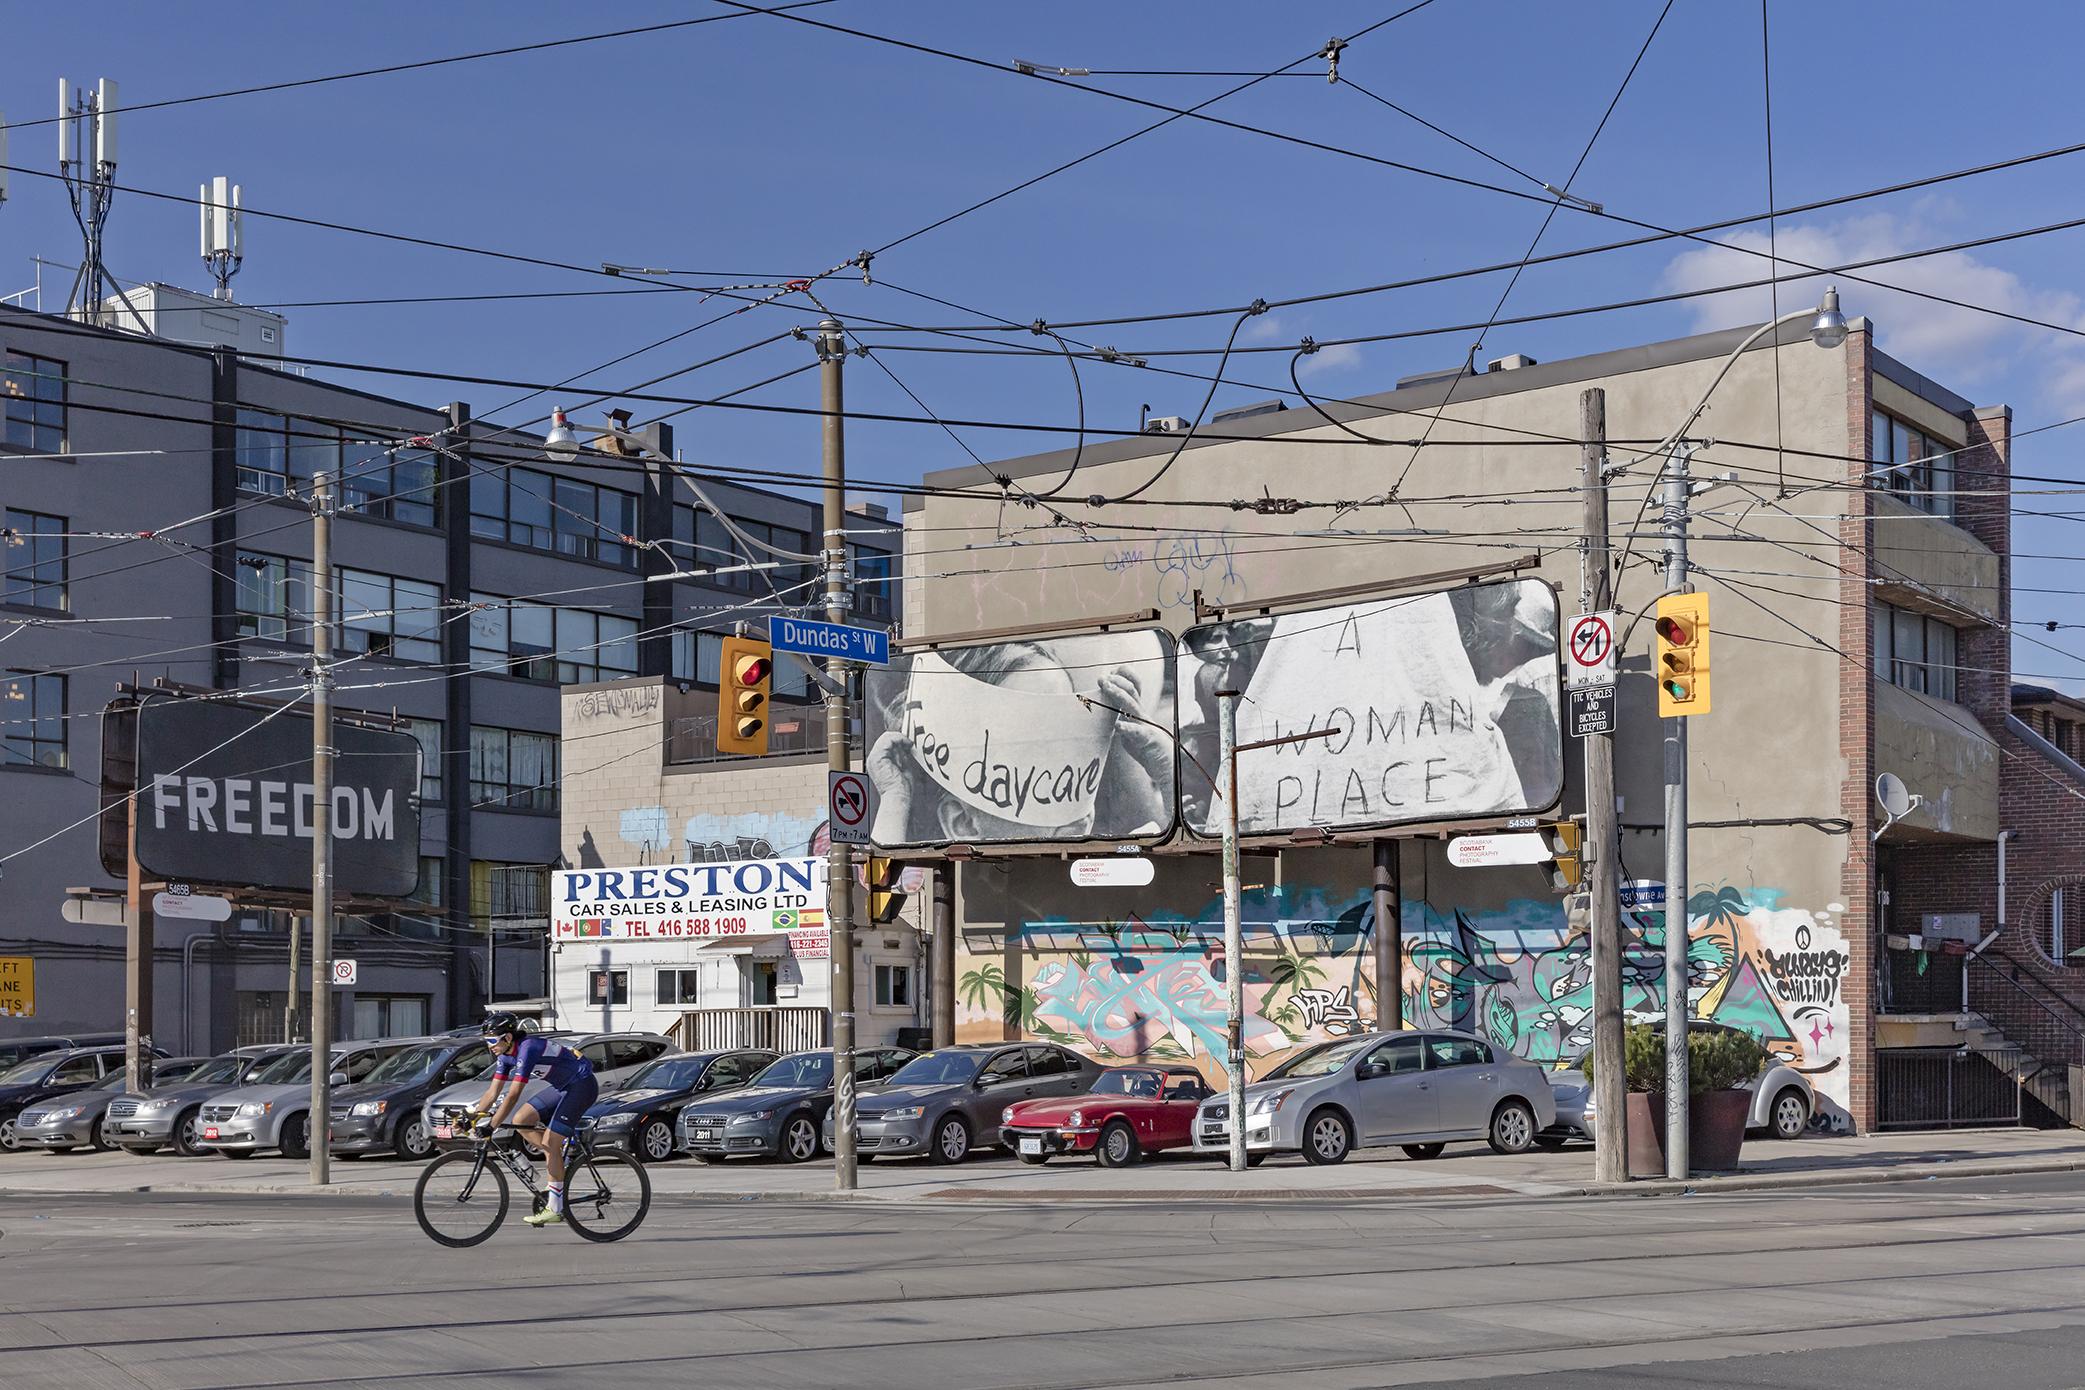 Carmen Winant, XYZ-SOB-ABC, Installation on billboards, Toronto, 2019. Photo: Toni Hafkenscheid. Courtesy CONTACT, the artist.